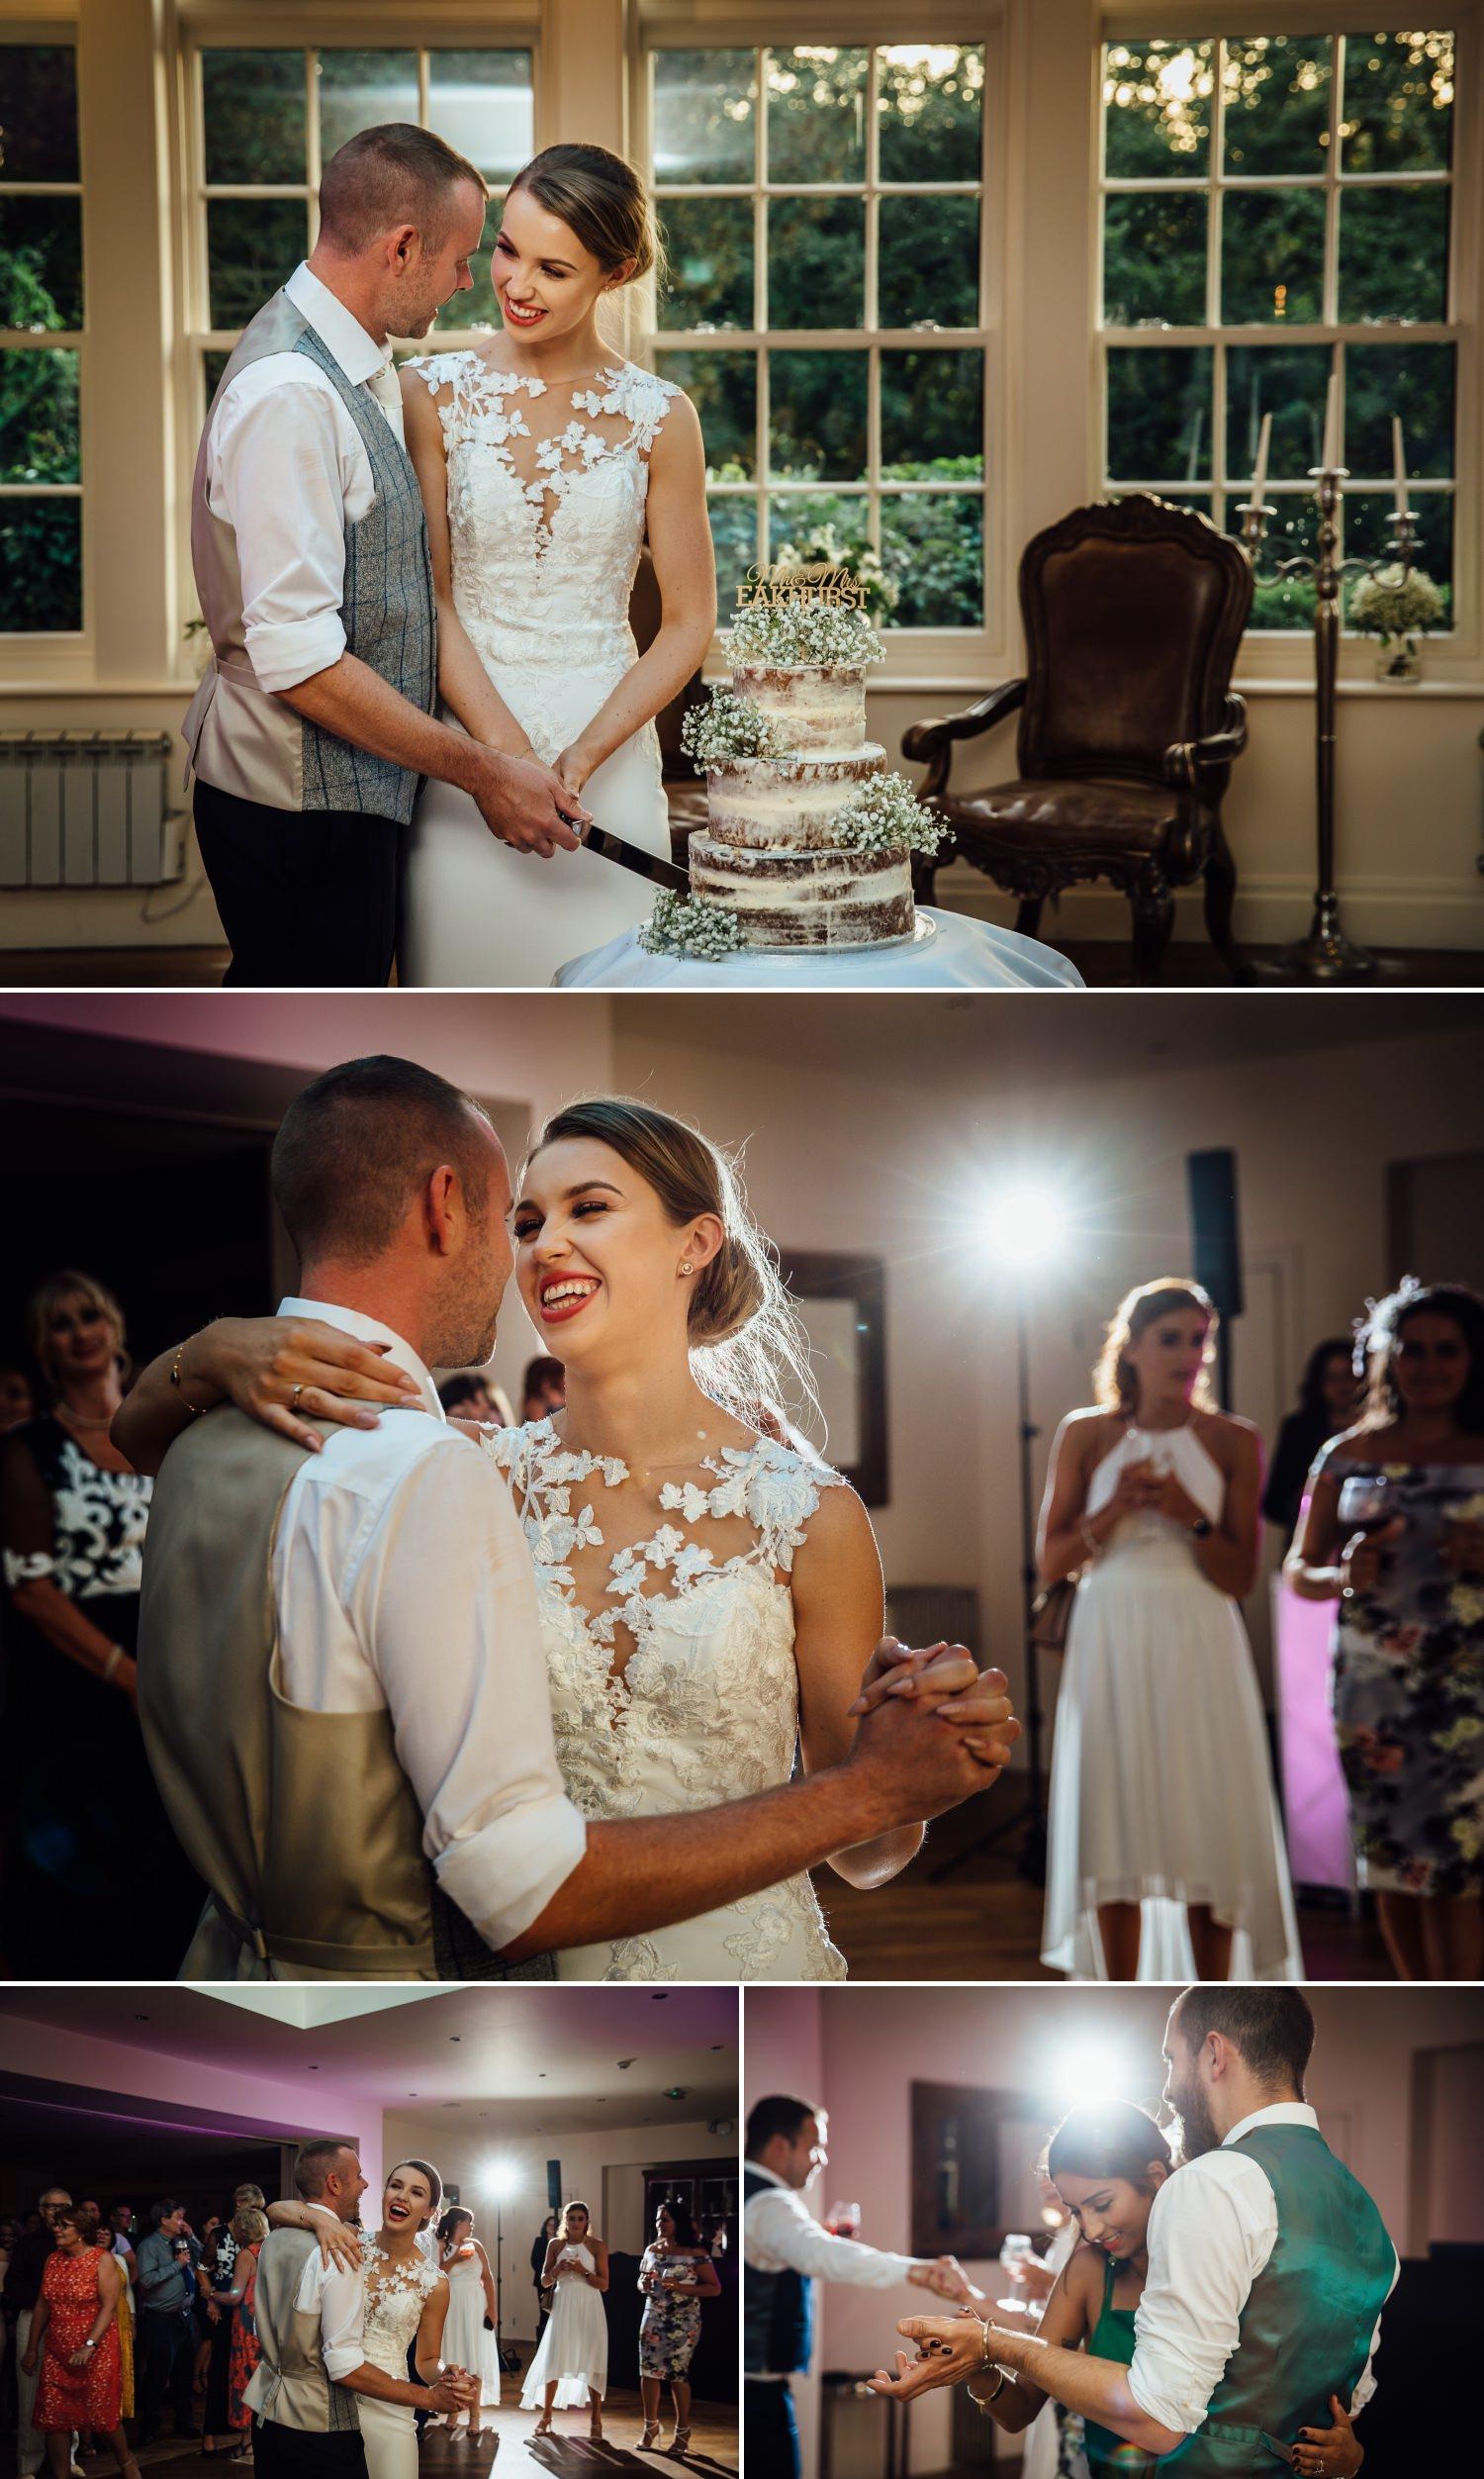 Wedding photography cake cutting at Milton Hall, Lancashire